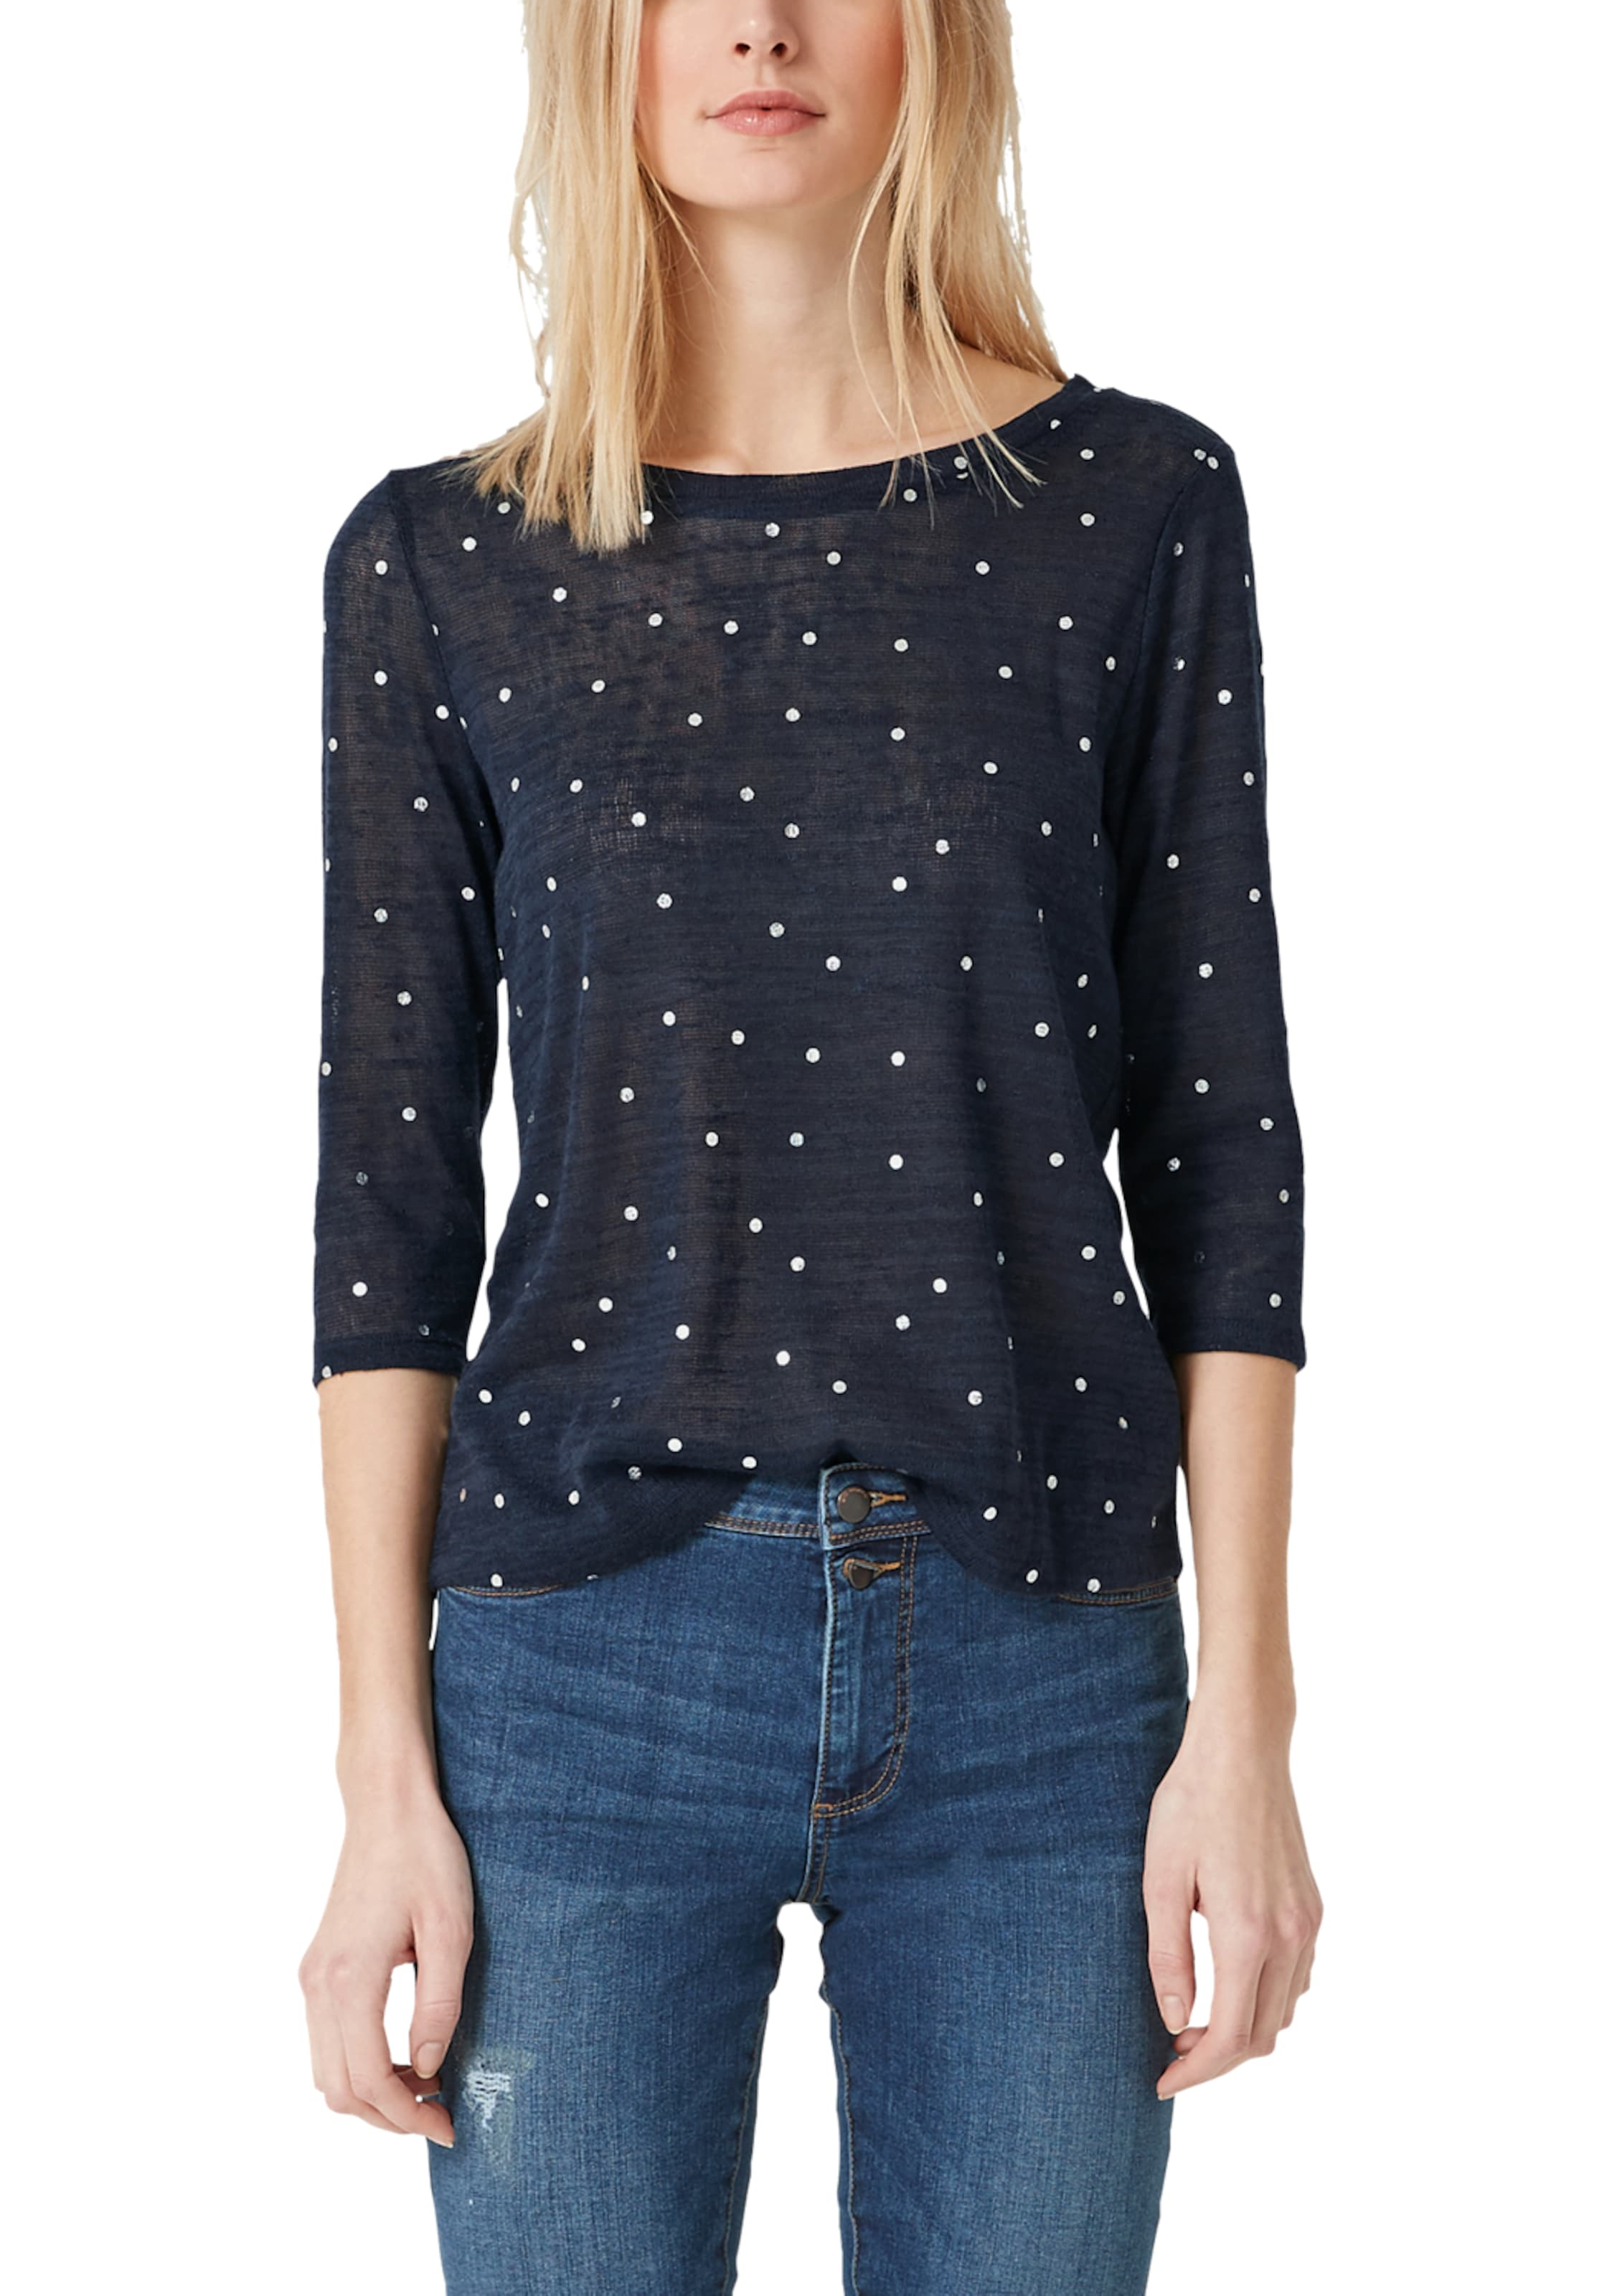 Shirt In s Designed NachtblauWeiß Q By R35qAjL4